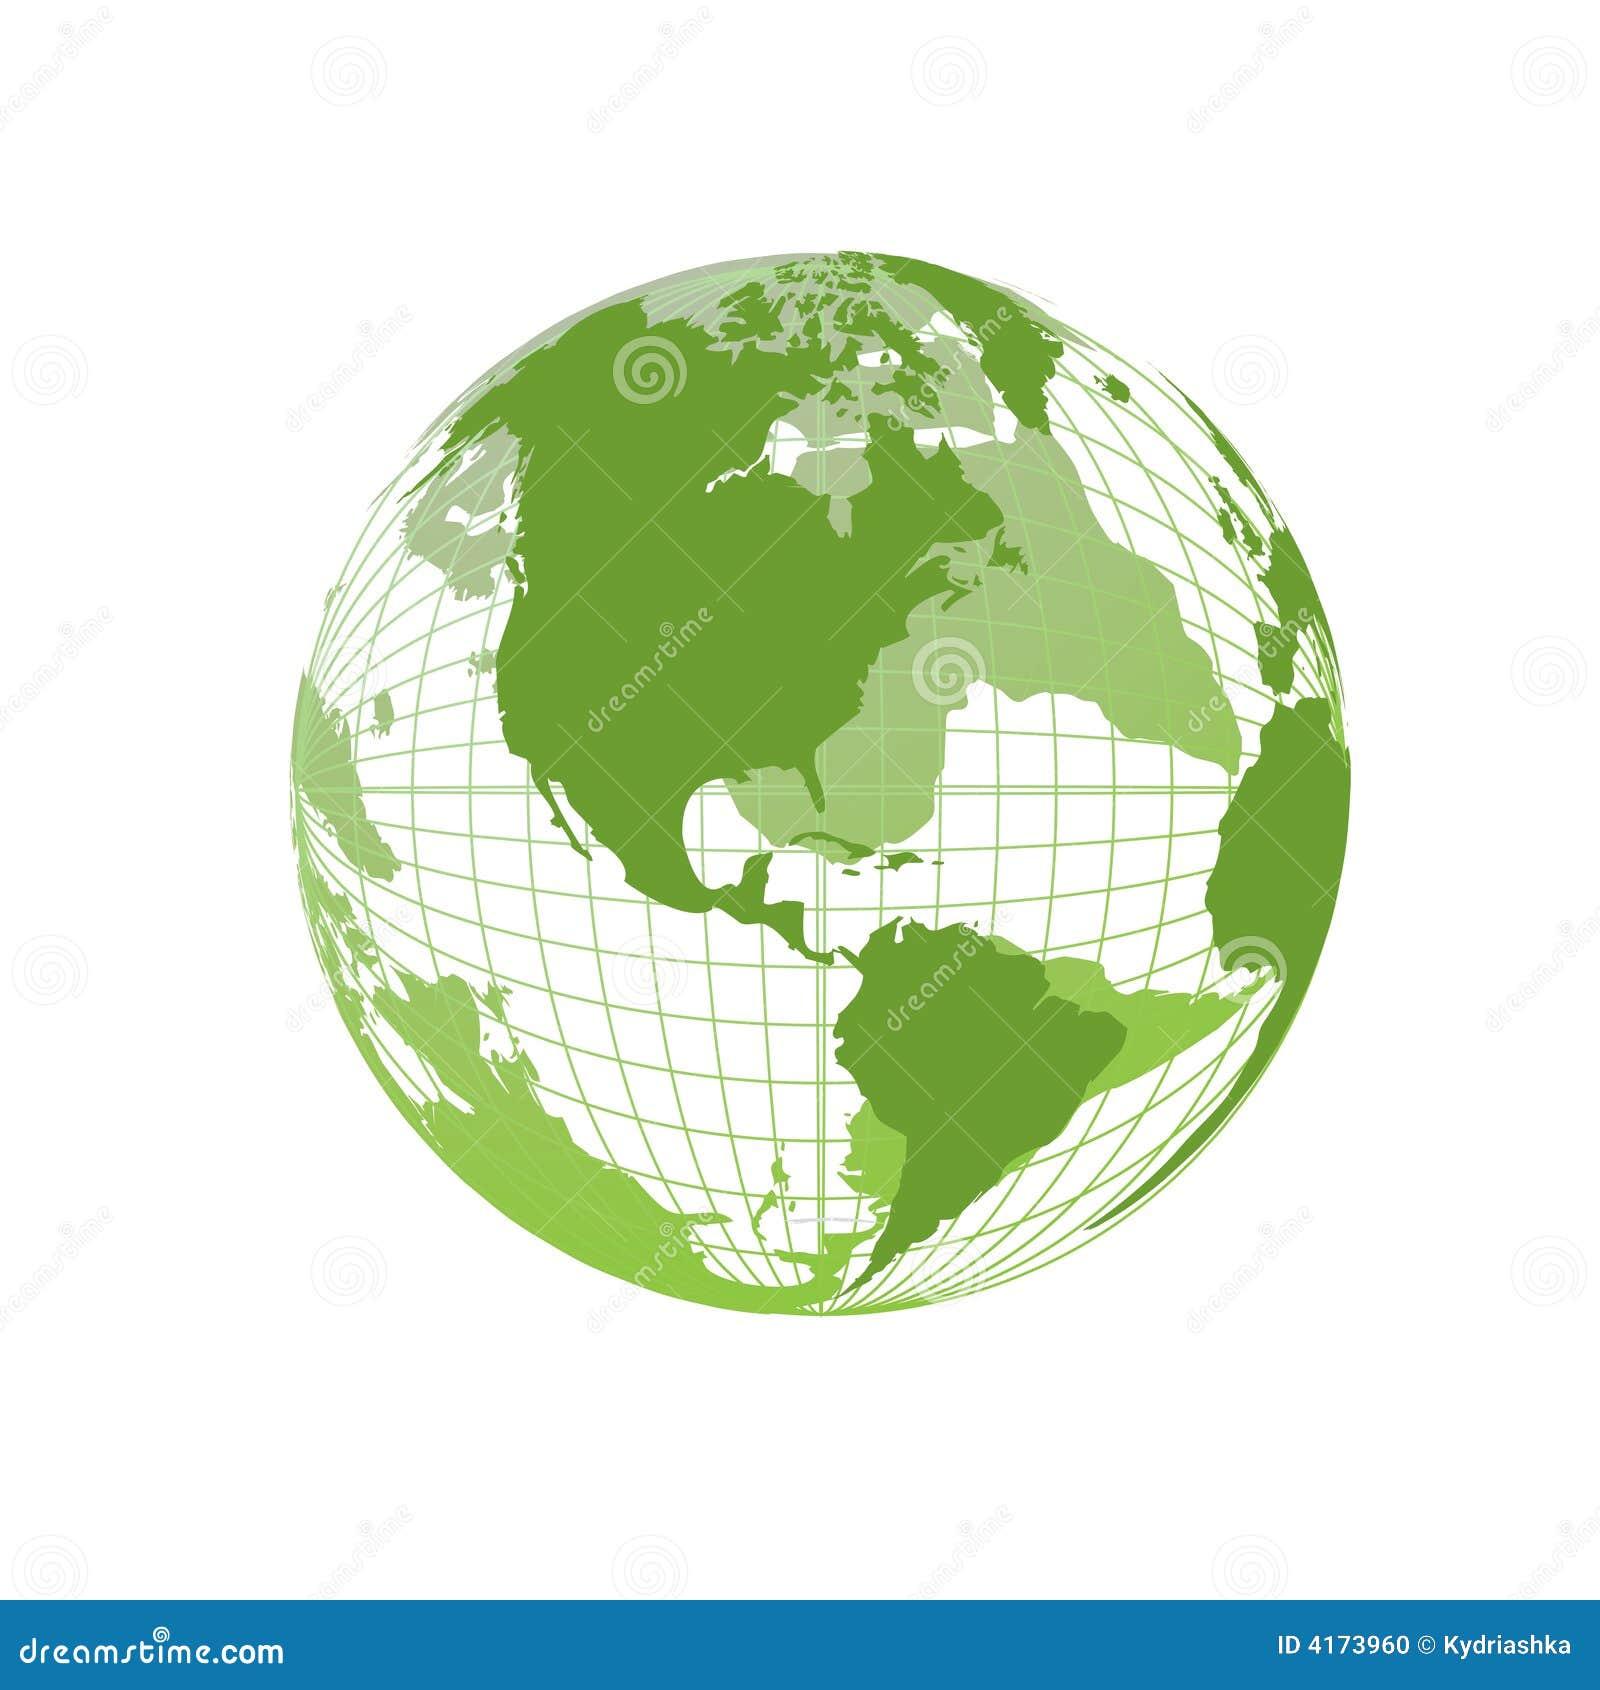 World map 3d globe stock vector illustration of mesh 4173960 world map 3d globe royalty free stock photo gumiabroncs Gallery